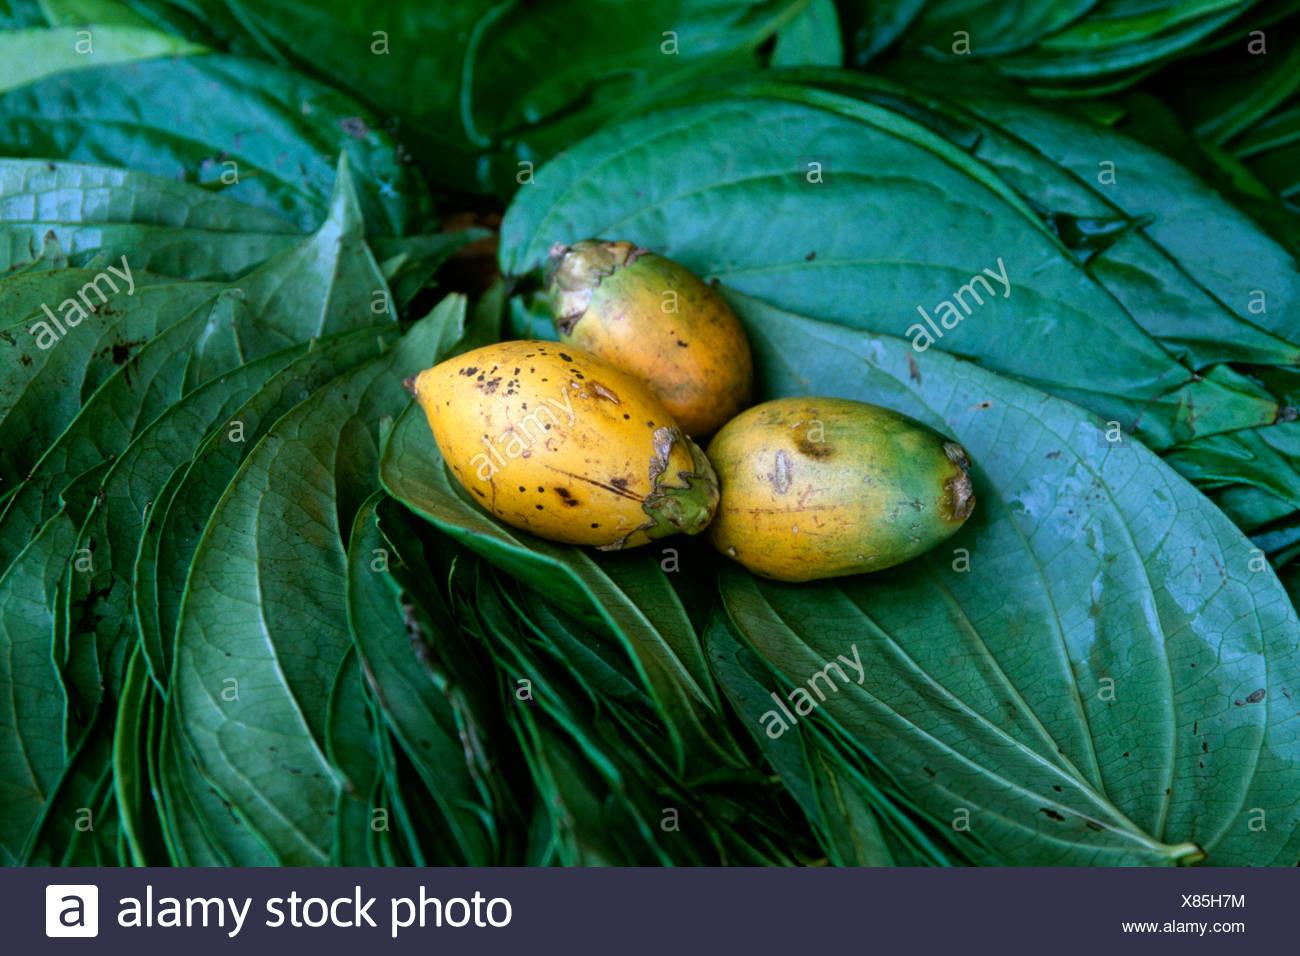 Betel Nut Tree or Betel Palm leaves (Areca catechu), Sri Lanka, South Asia - Stock Image